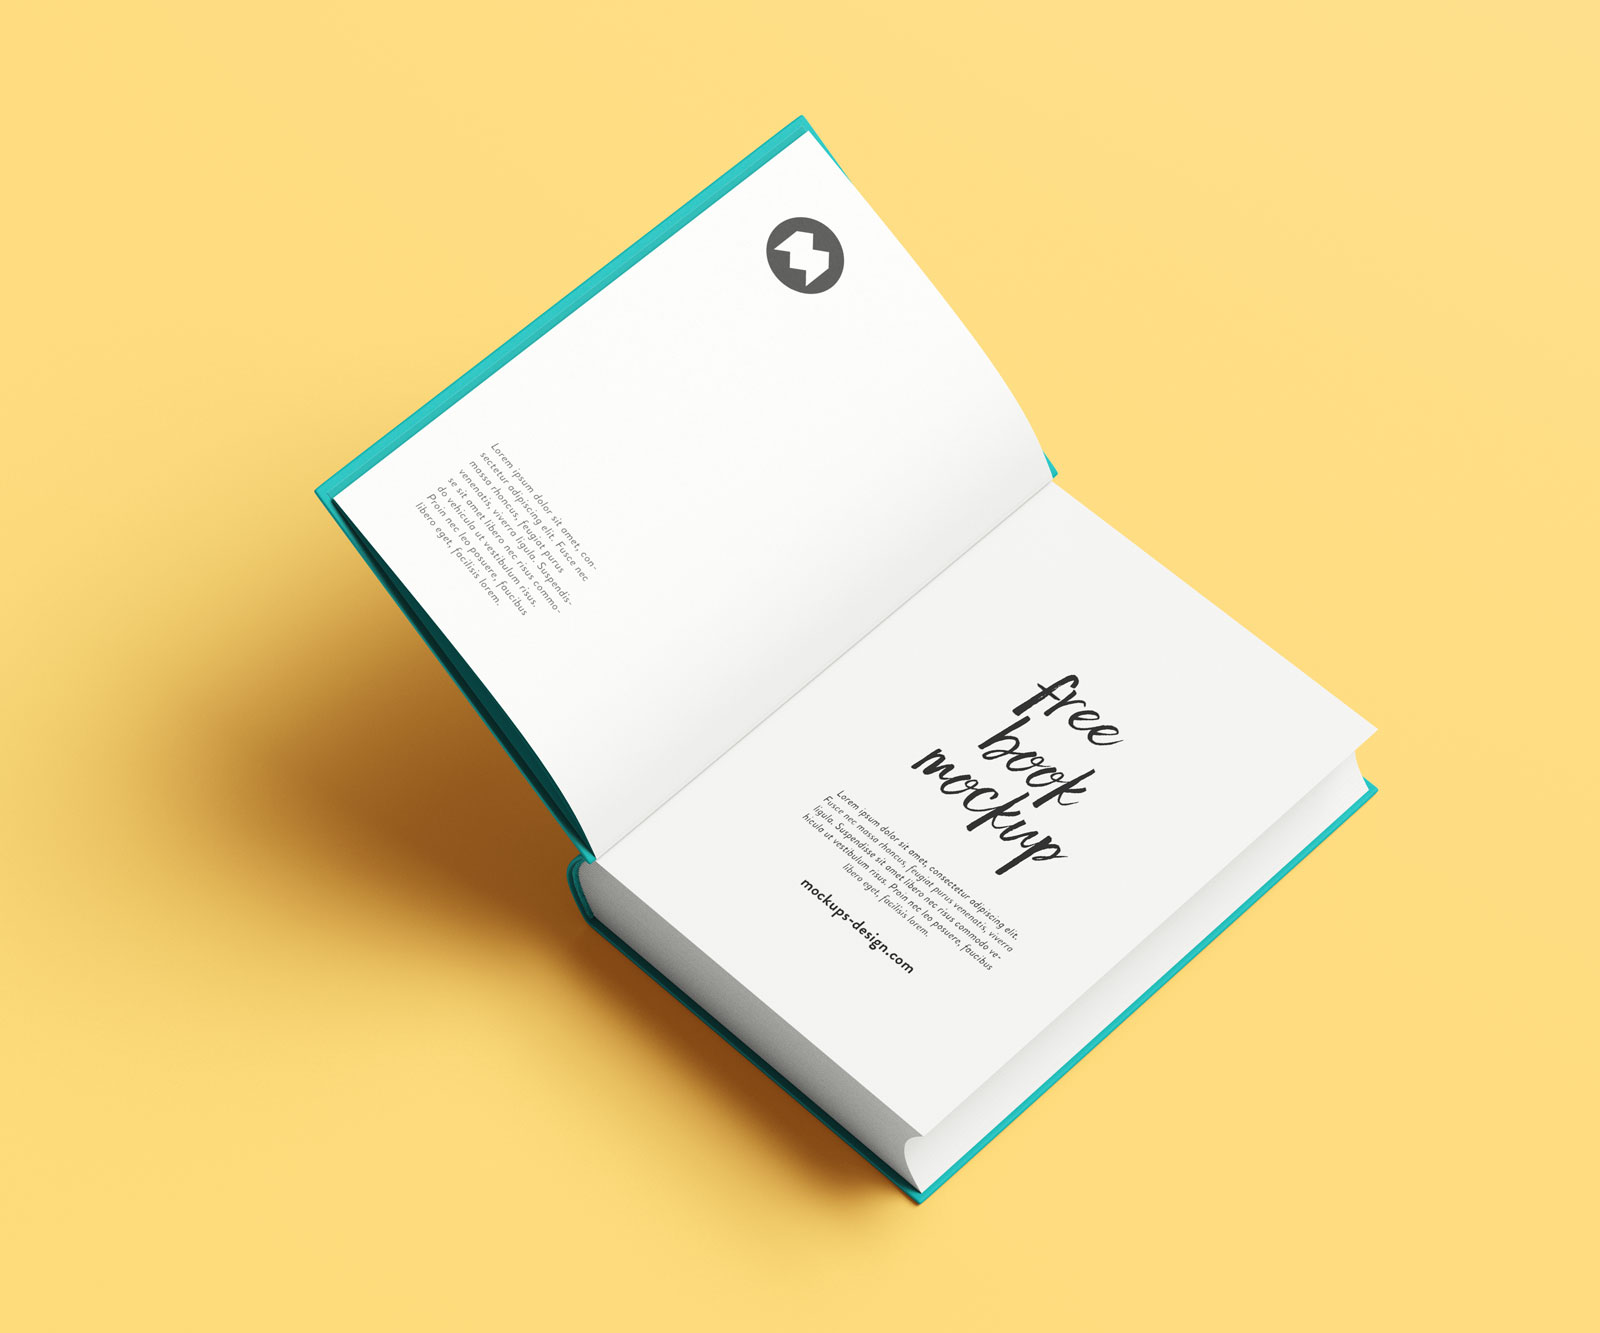 Free-Premium-Thick-Book-Mockup-PSD-7